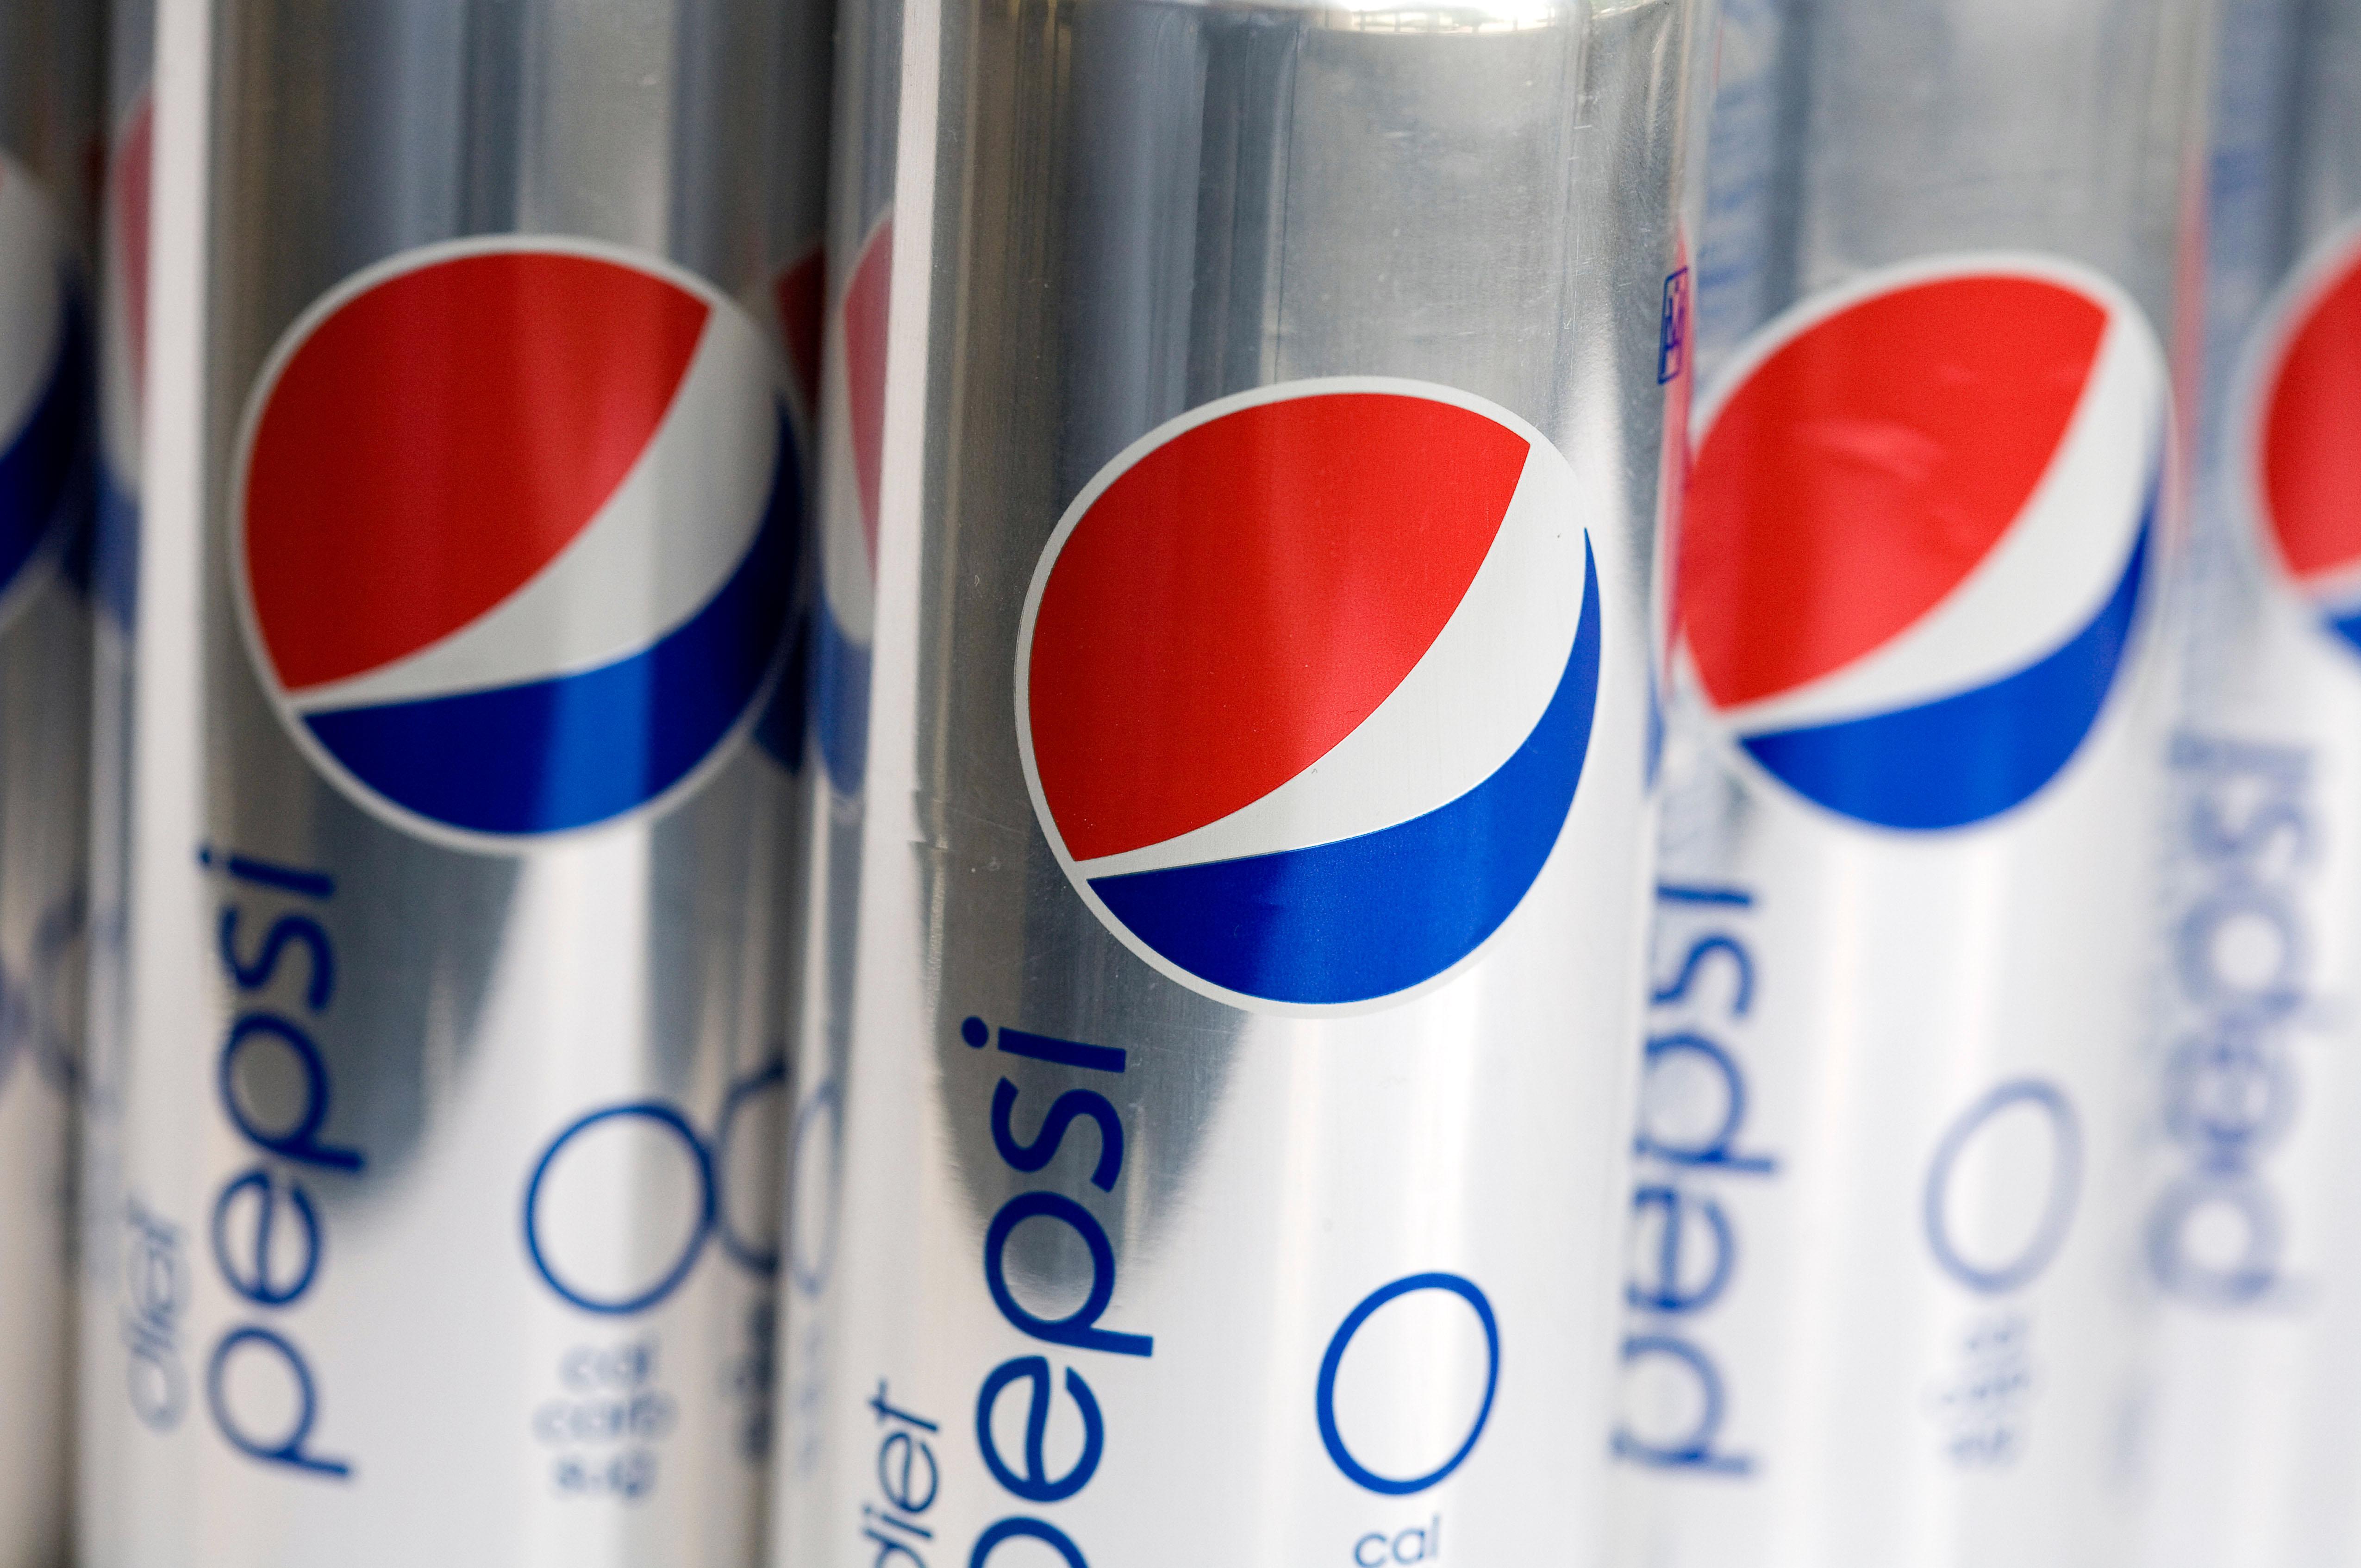 Diet Pepsi cans